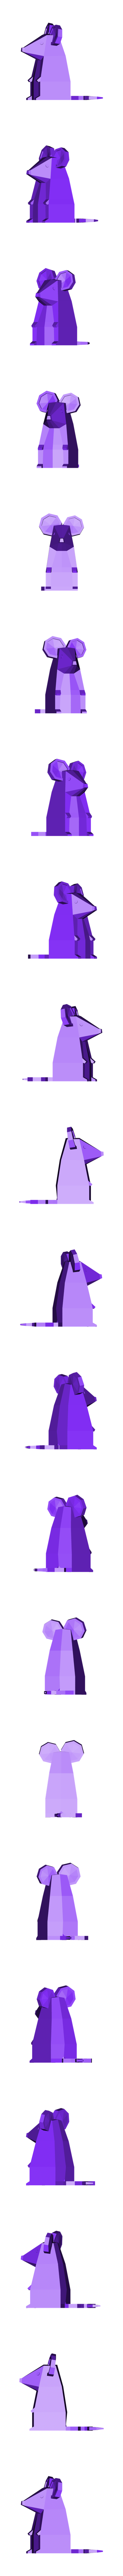 Mouse_01.obj Download free OBJ file Mouse • 3D printer model, Colorful3D